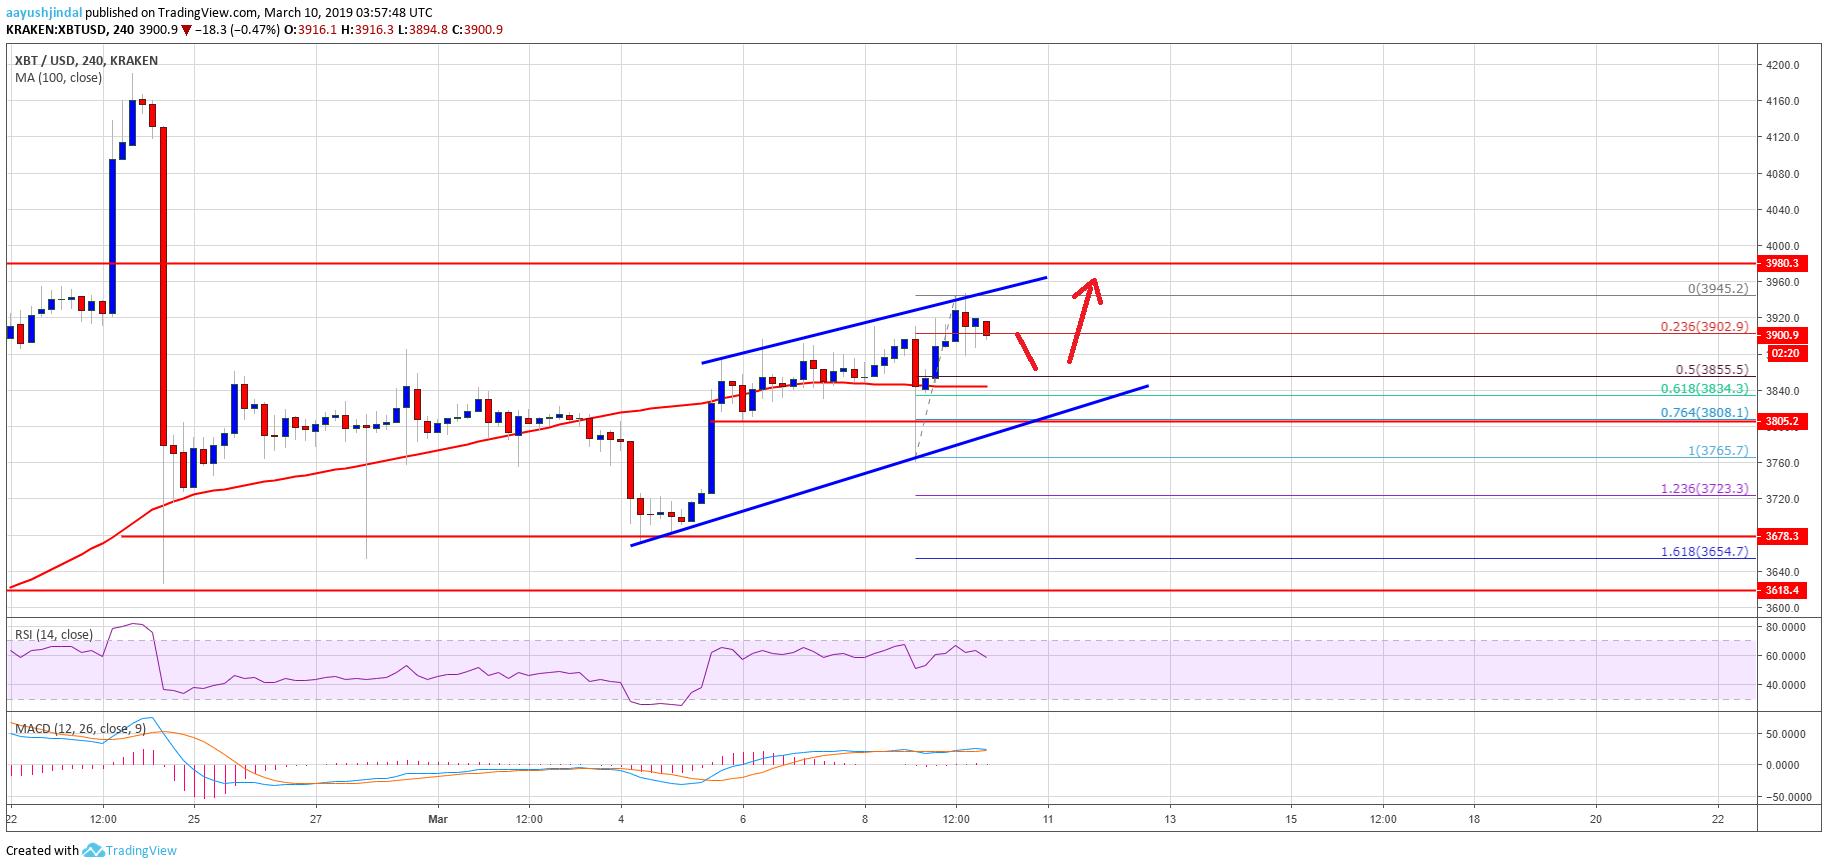 Bitcoin (BTC) Price Weekly Analysis - Trend Overwhelmingly Bullish To $4,200